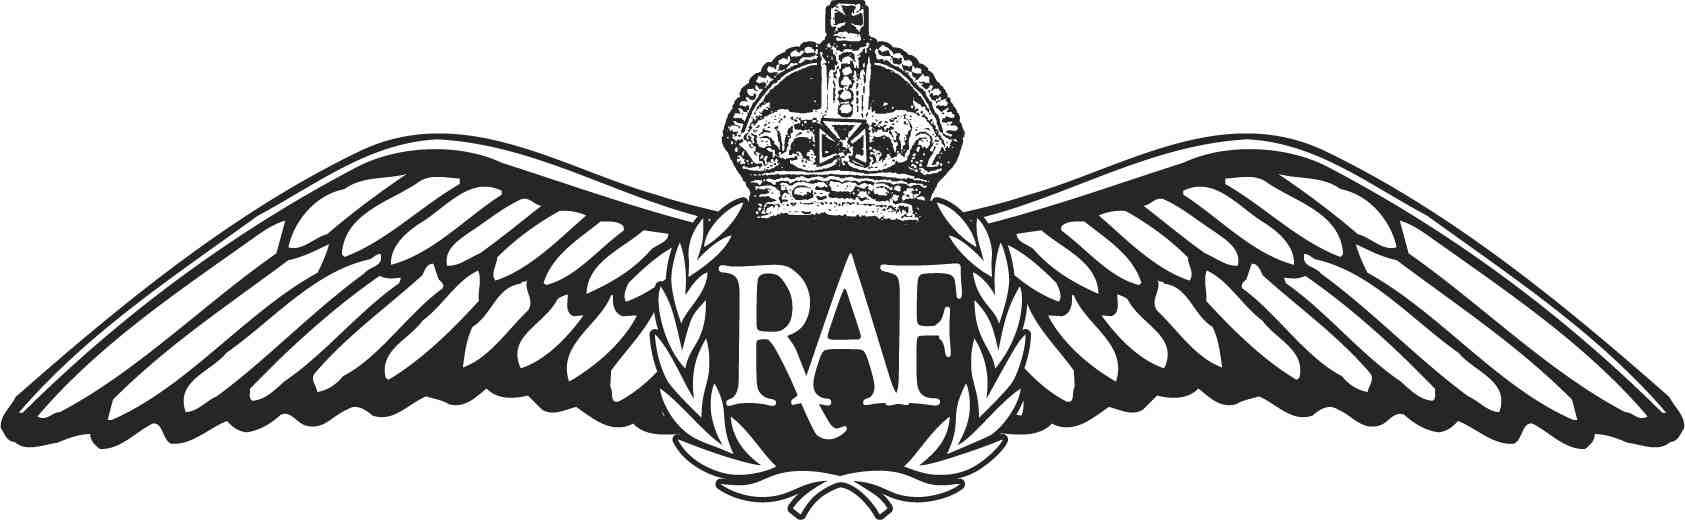 Pilot Wings Logo Clip Art Raf Pilot Wings #WY7UMg.